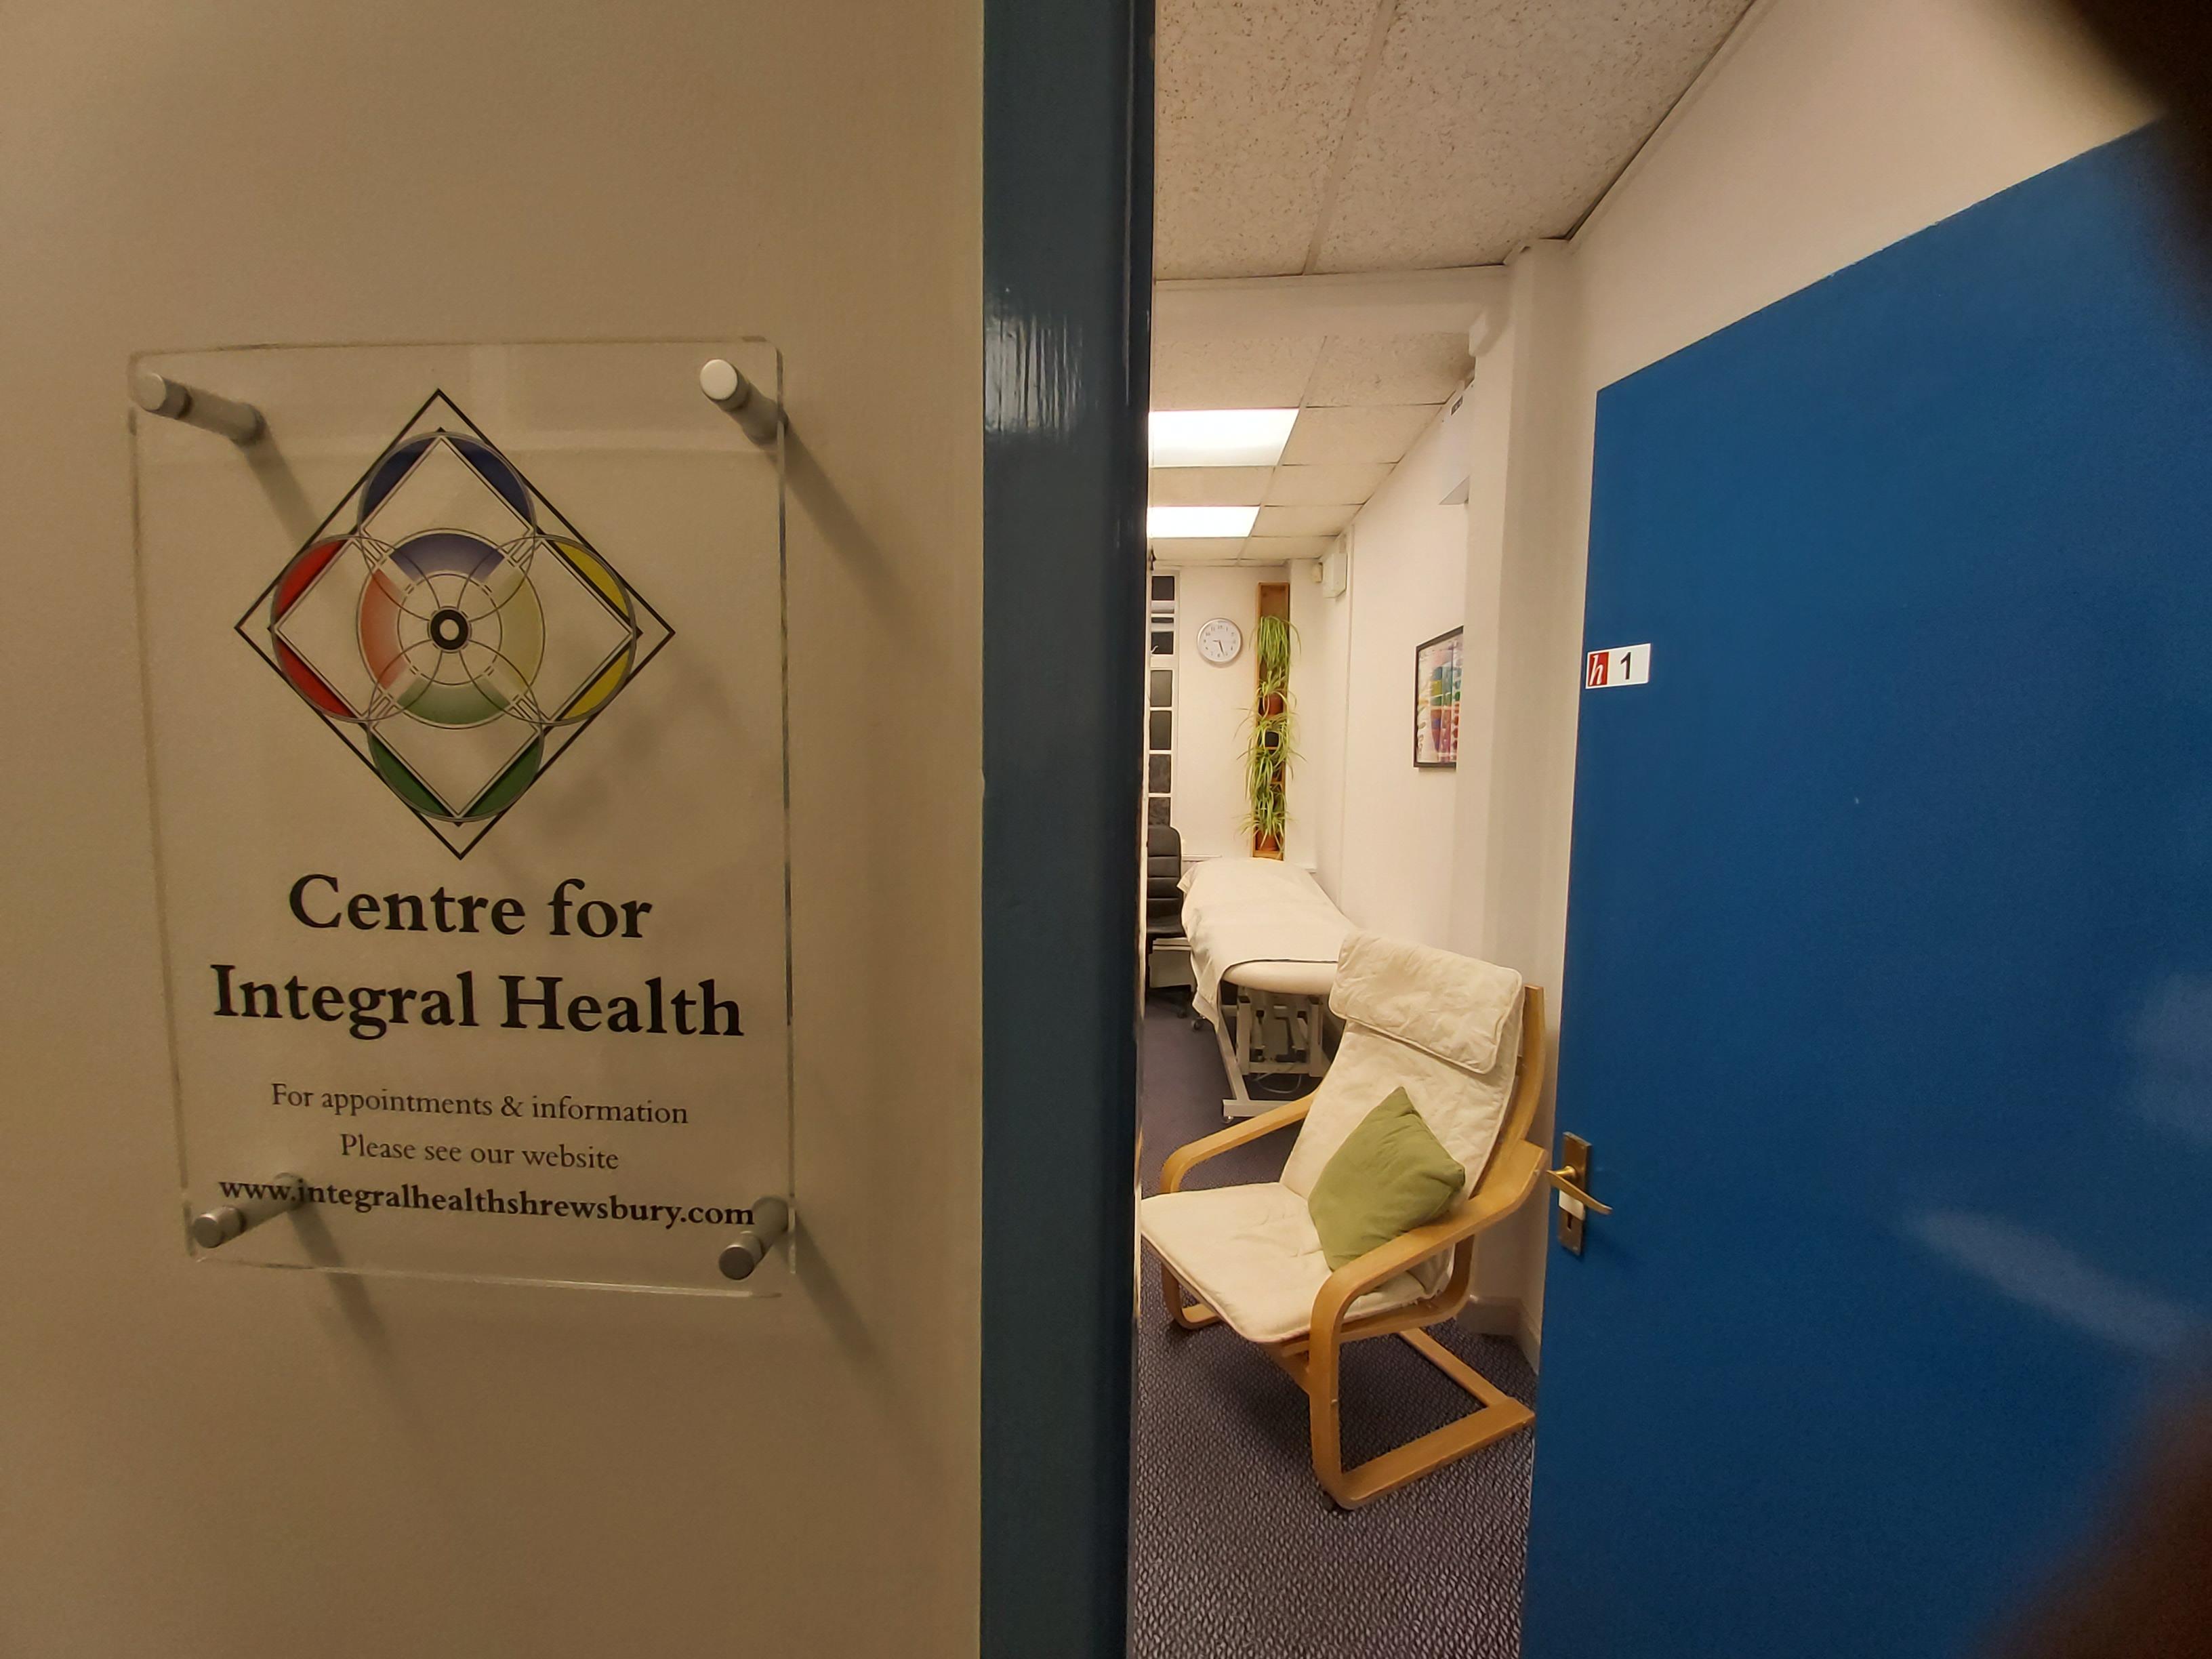 https://integralhealthshrewsbury.com/assets/images/gallery/blog-4/new-office-entrance_thumb.jpg